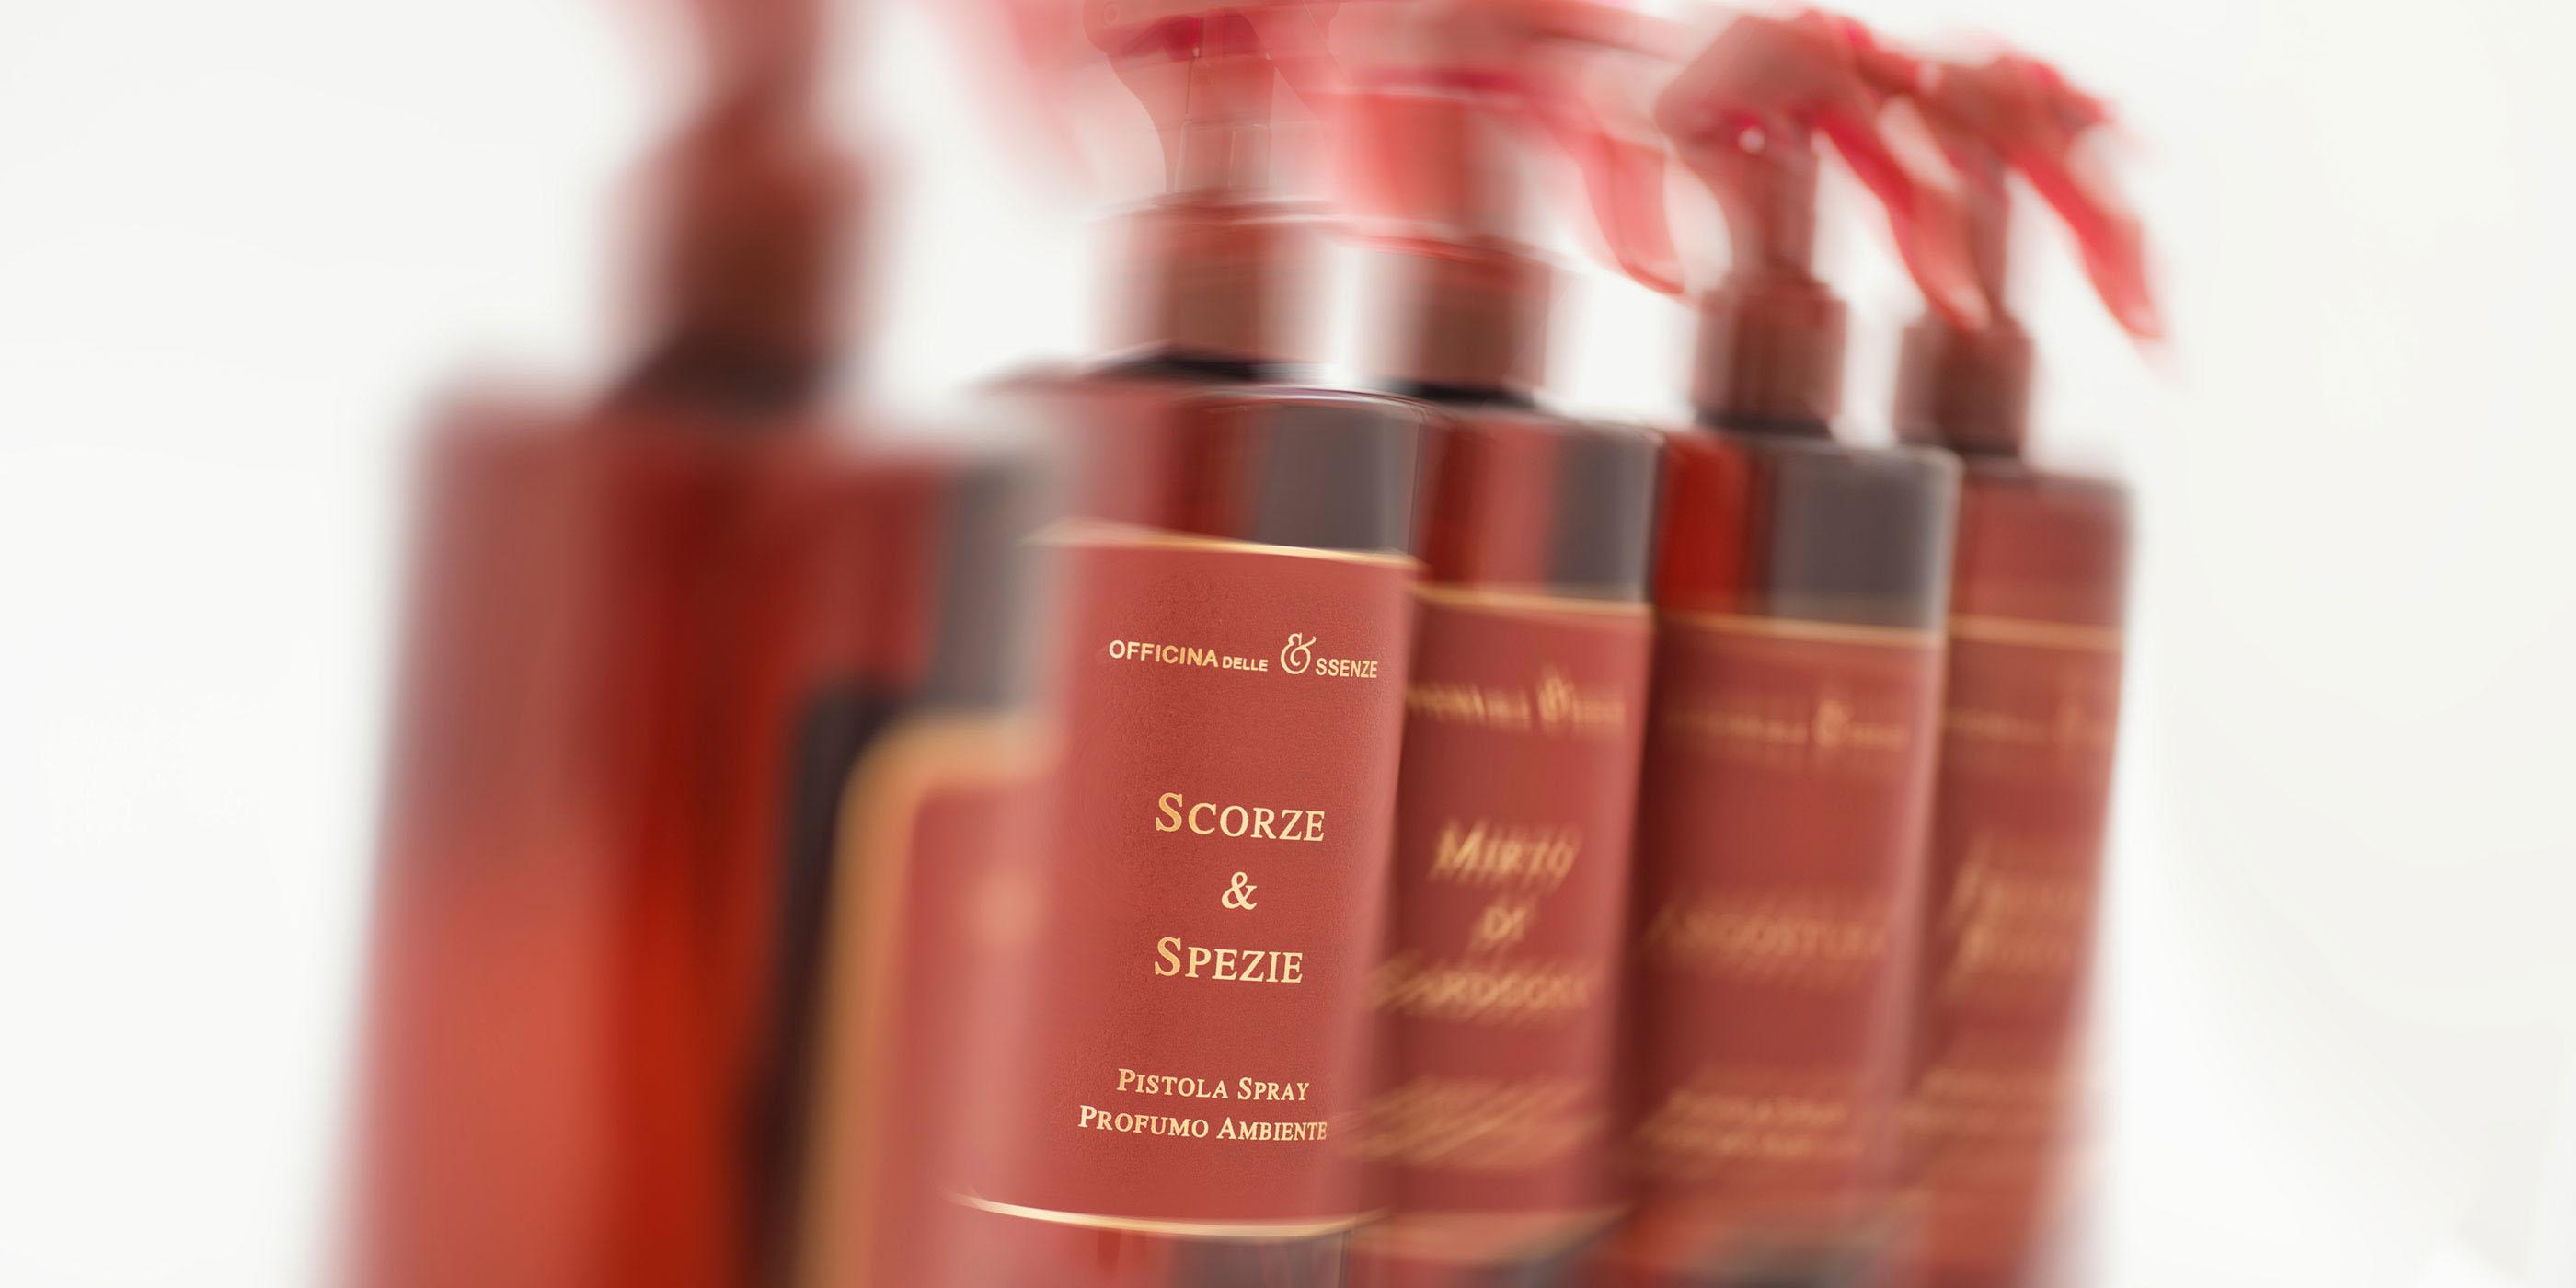 Officina delle Essenze Pistol Spray Home Fragrance